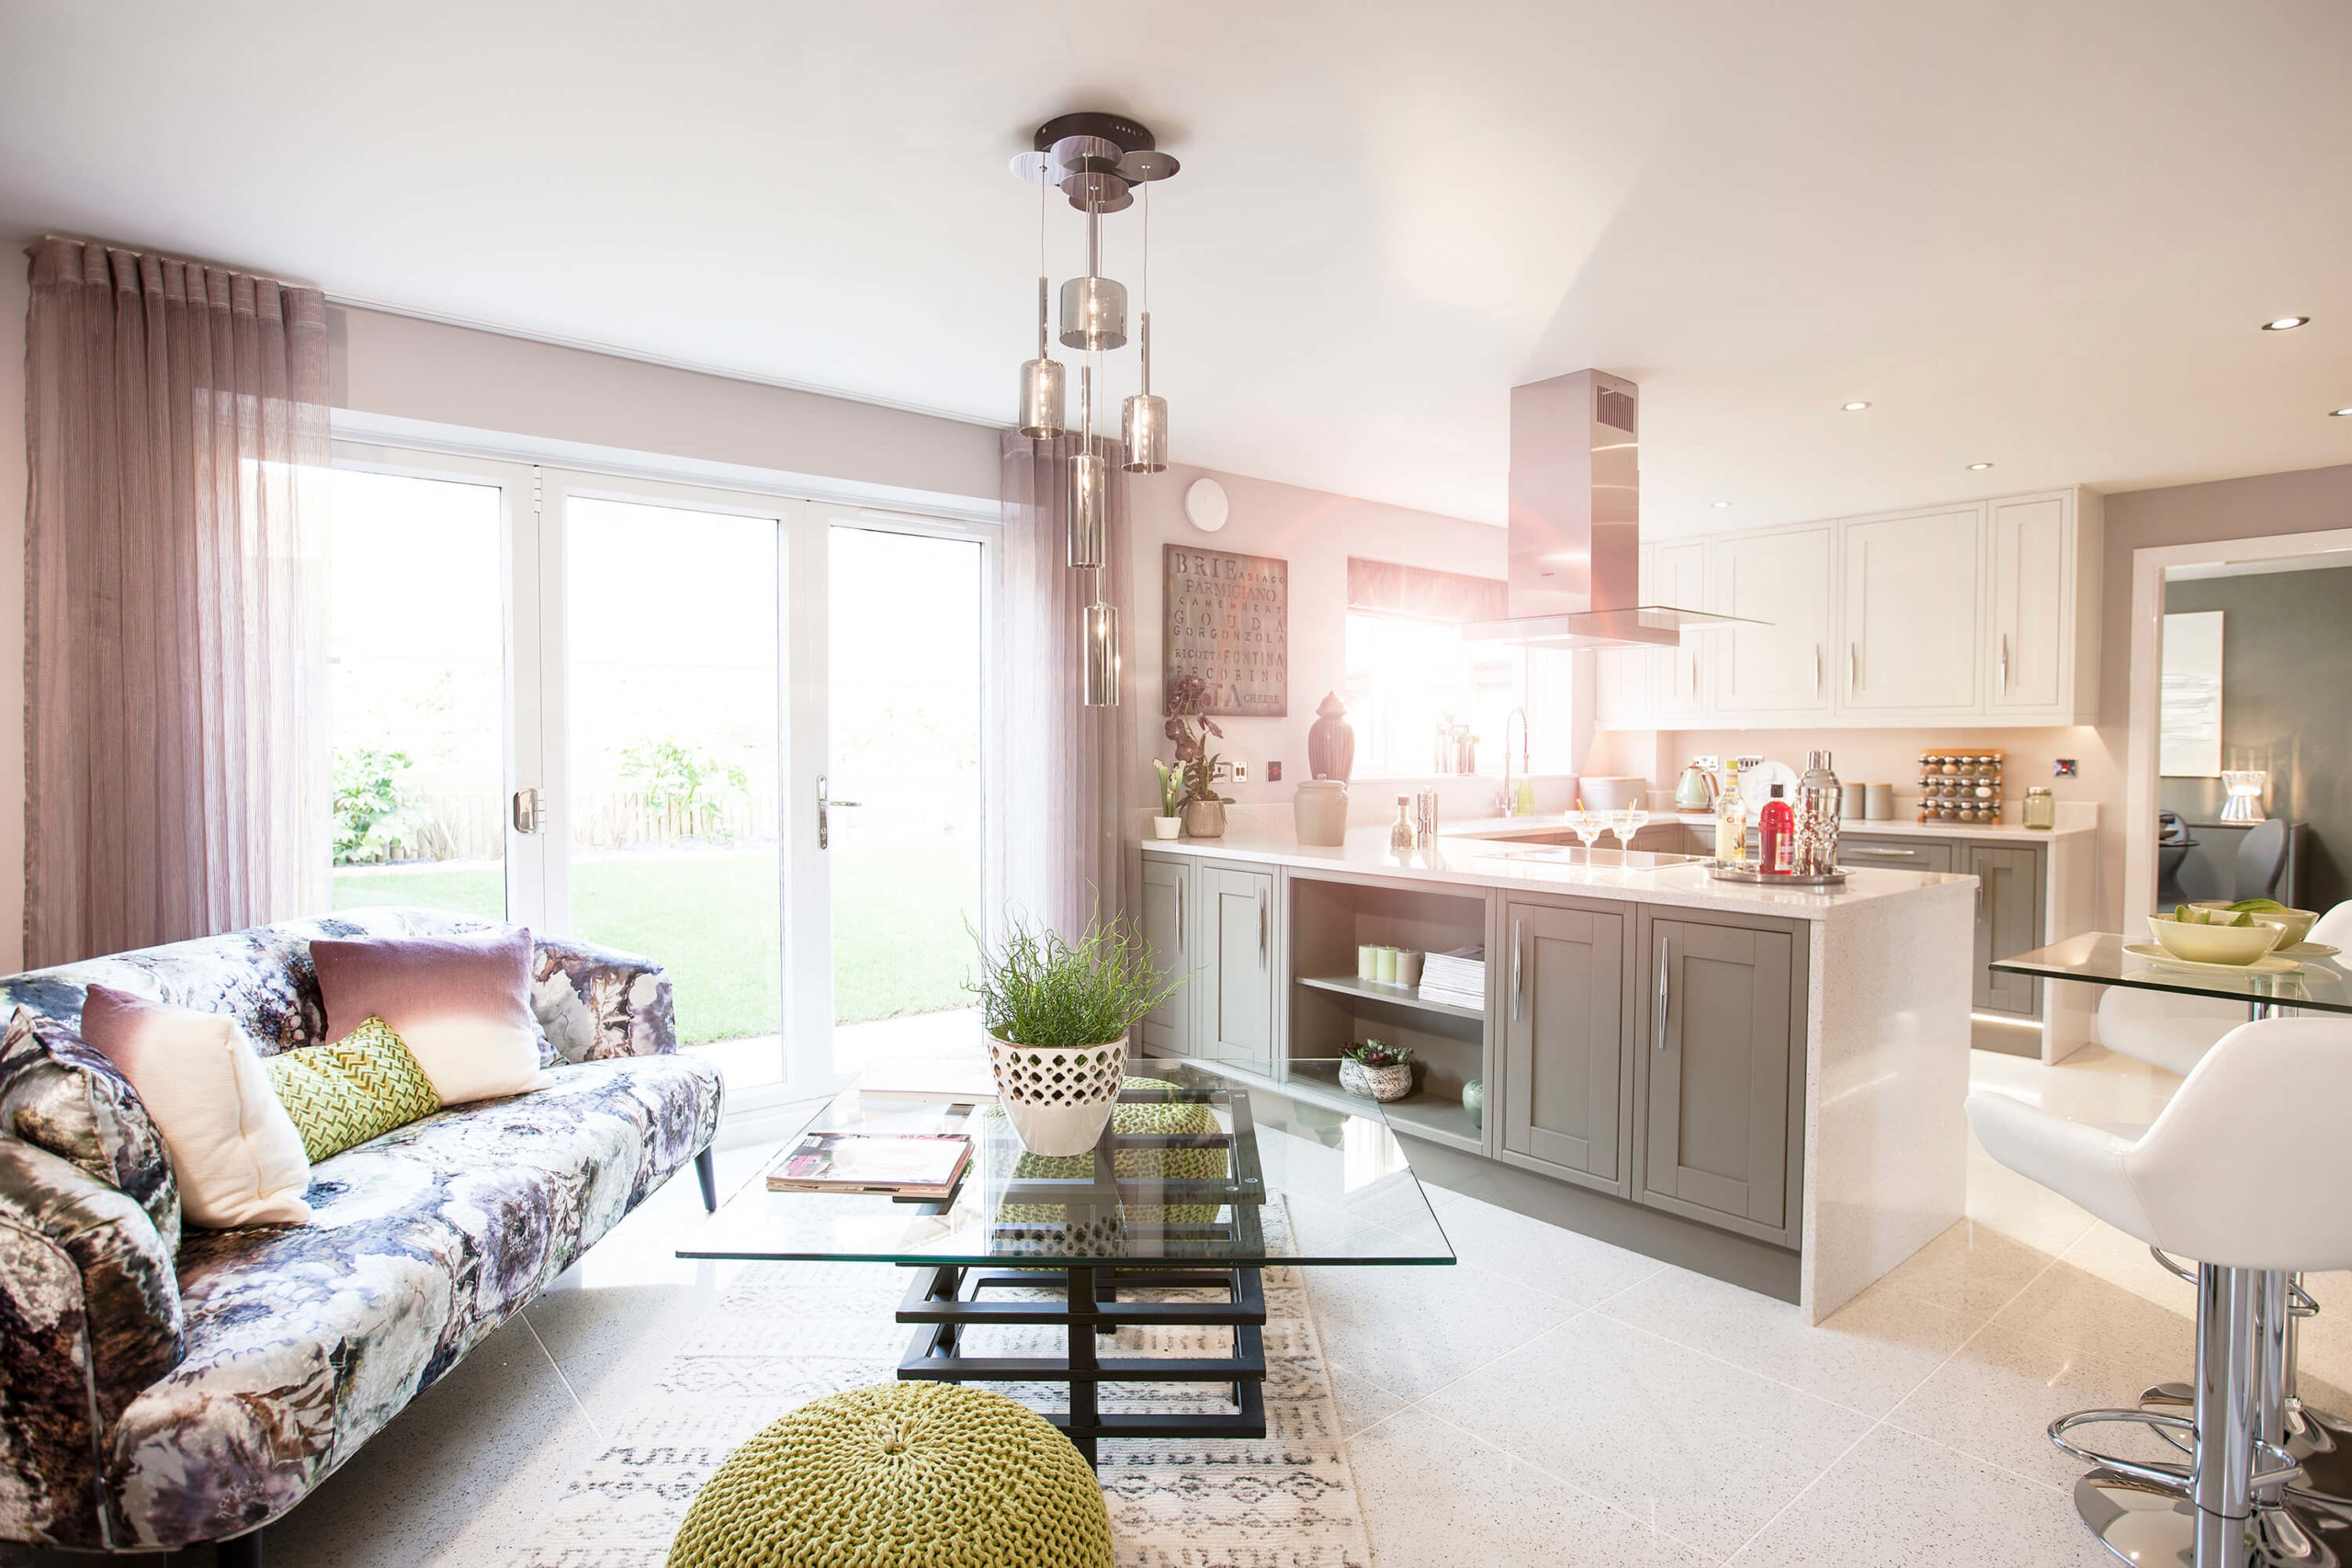 Bloor Homes at Ashbourne